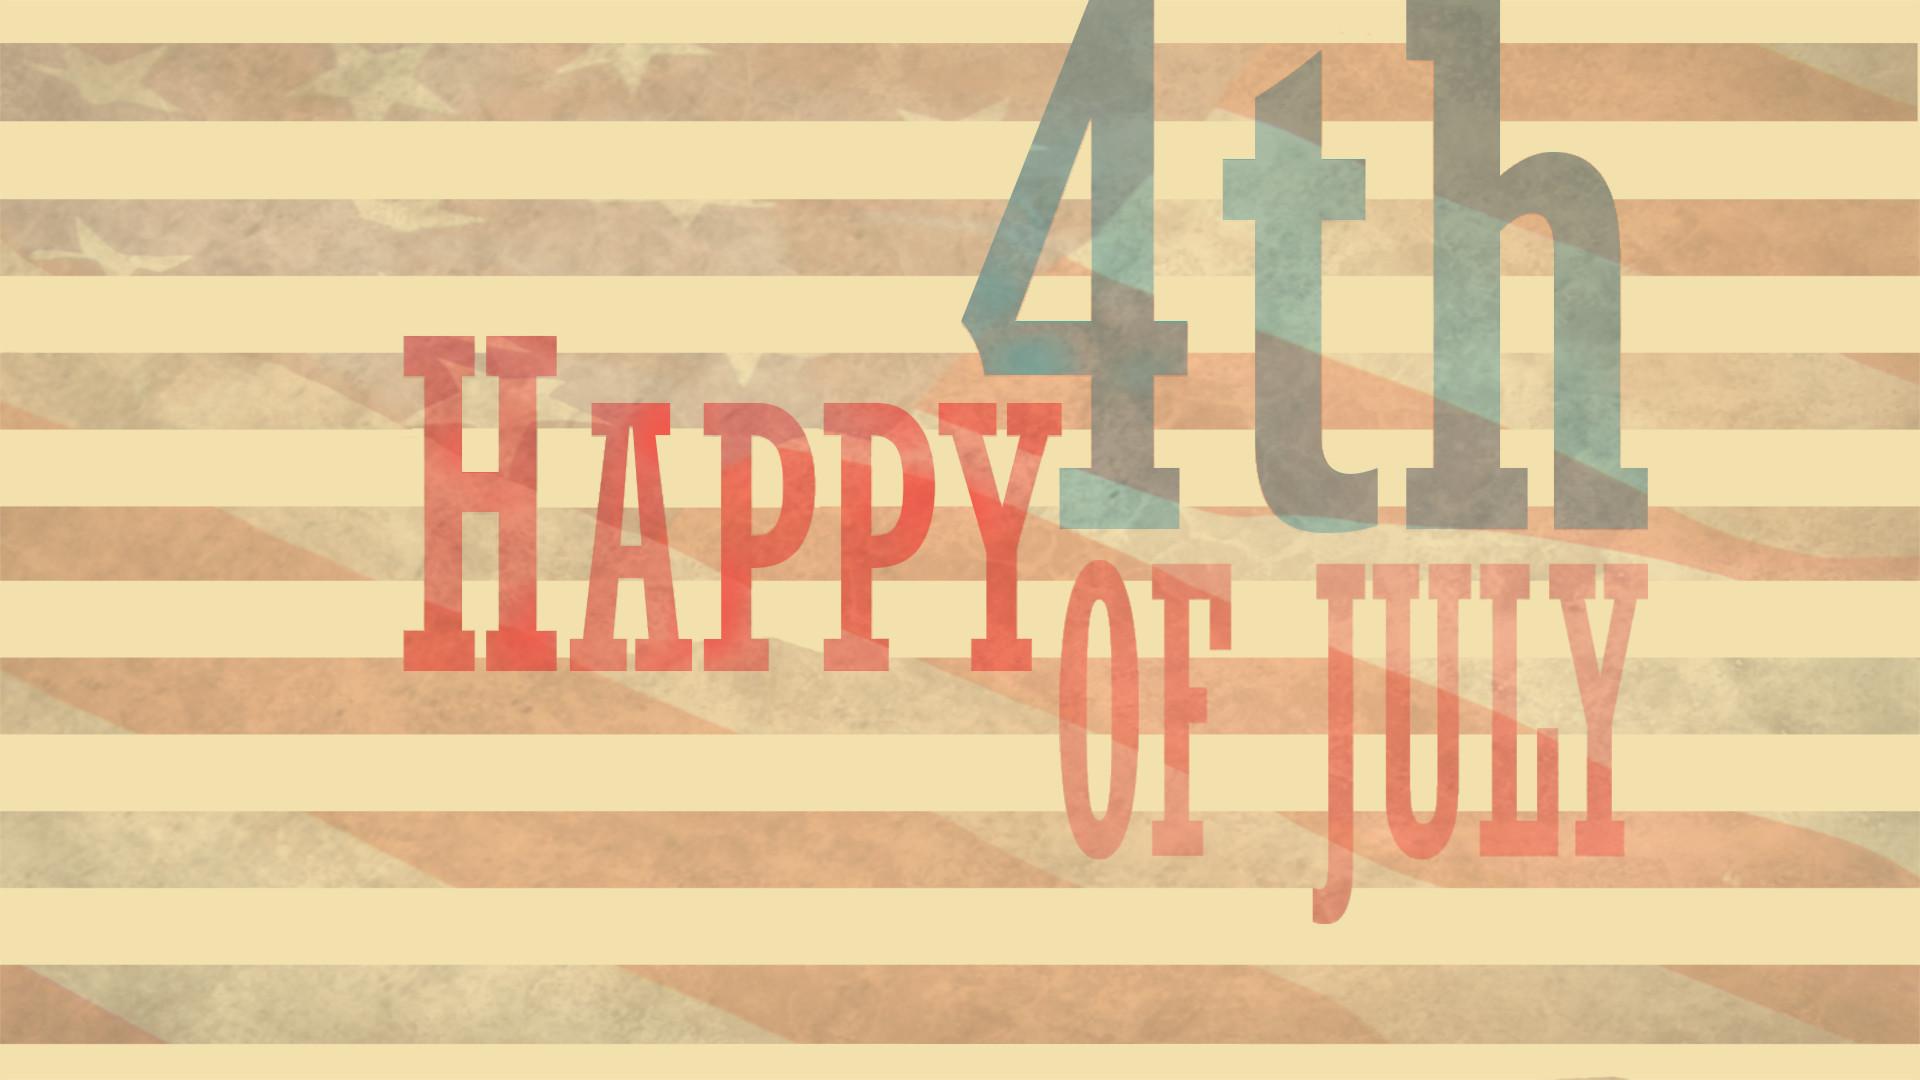 HD 4th Of July Image.